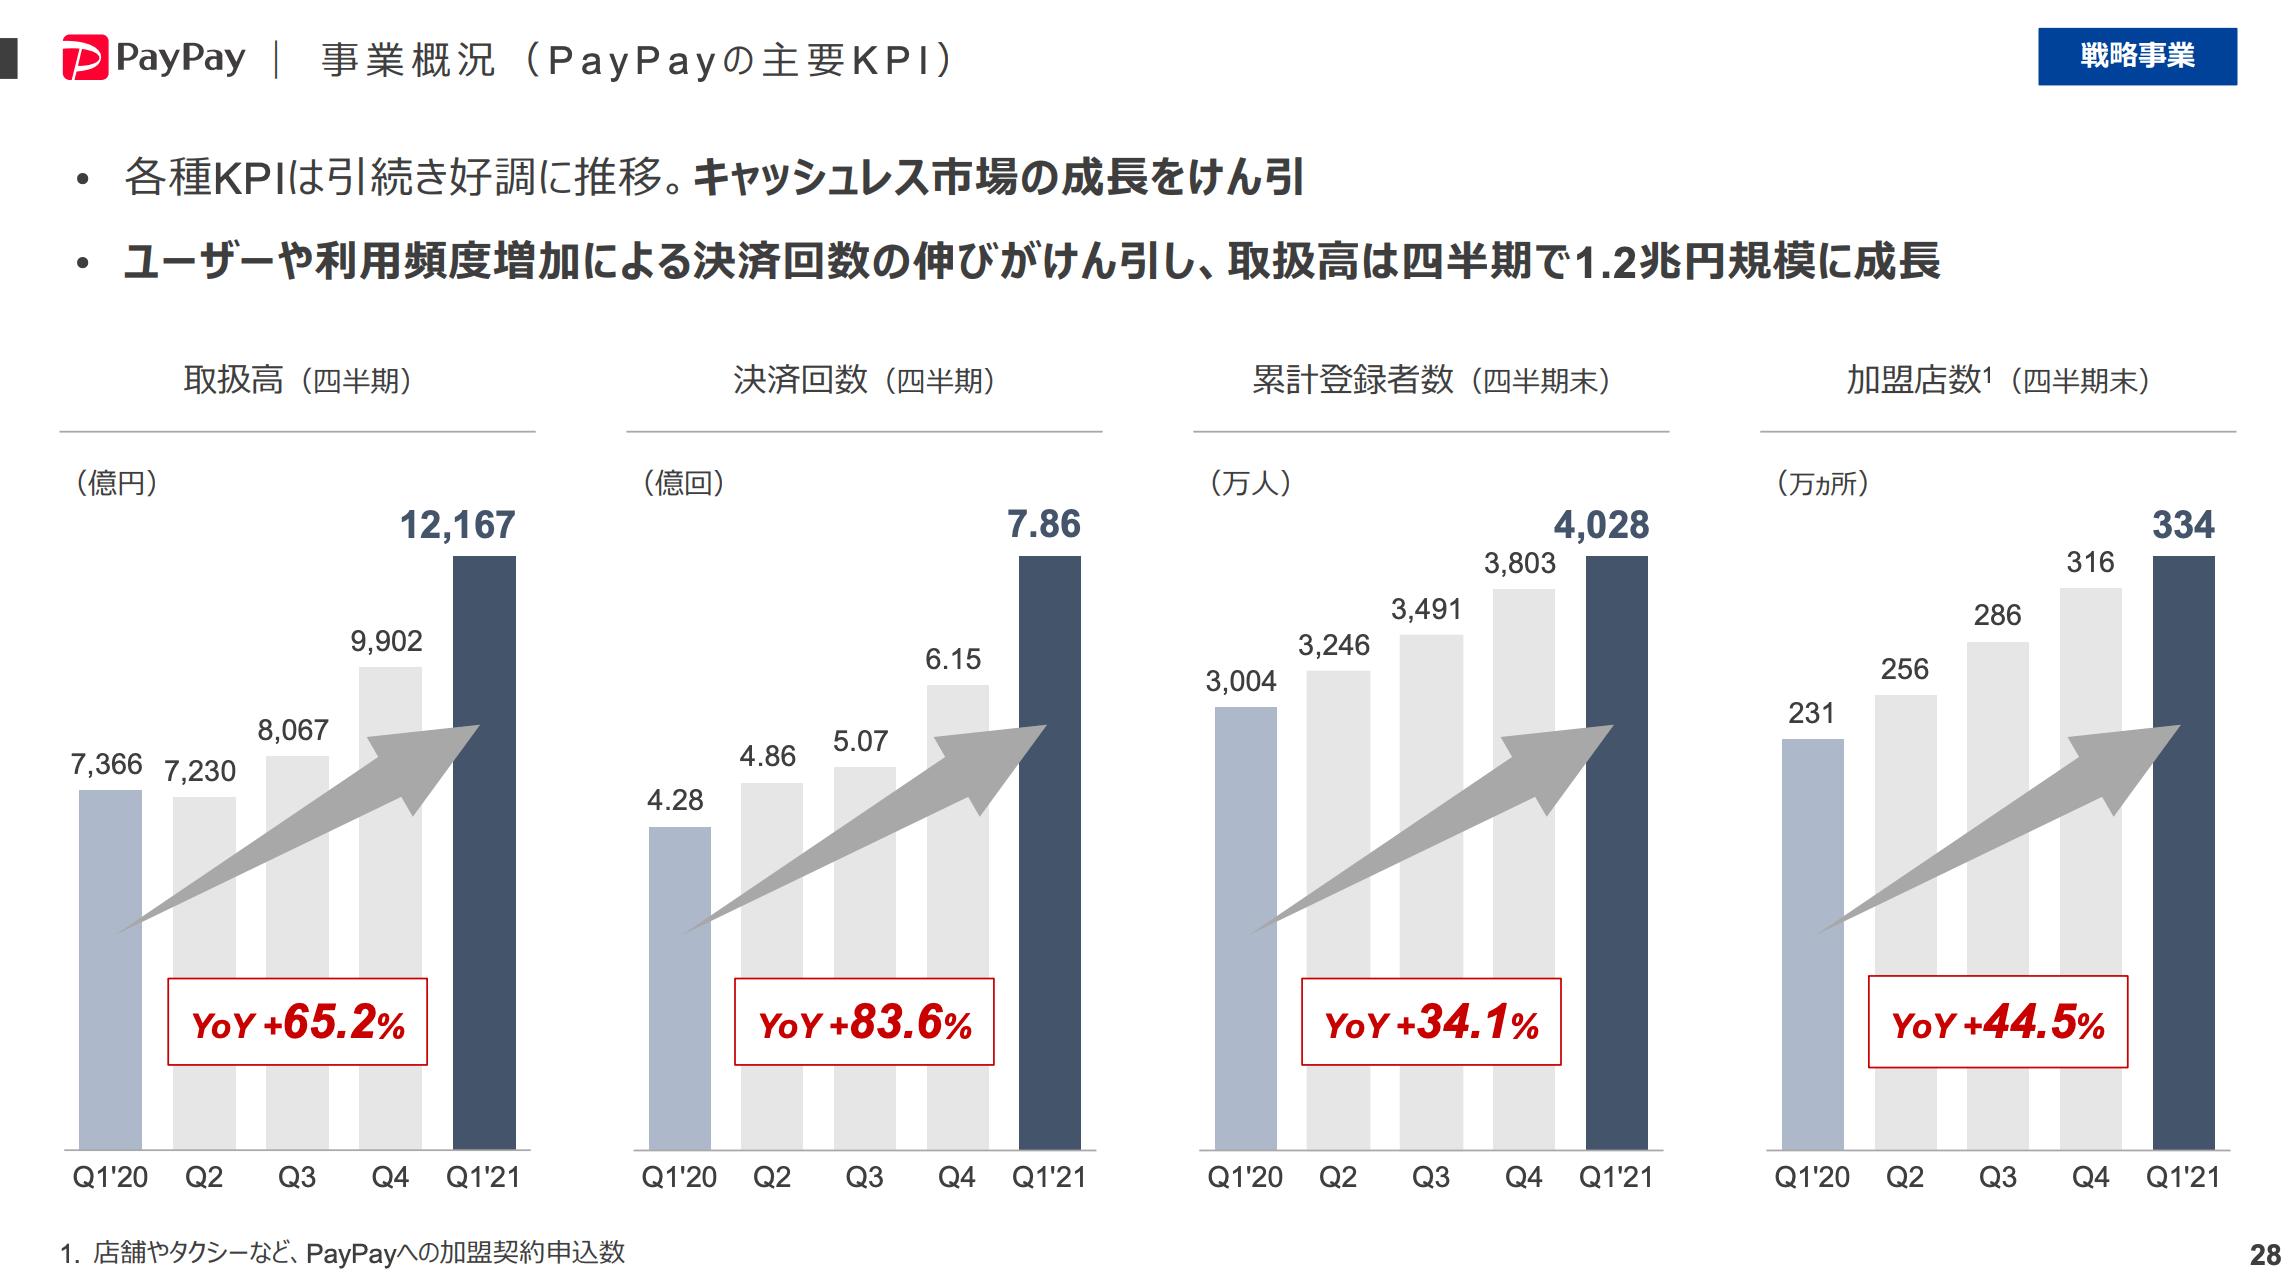 paypay主要KPI(21年6月末)